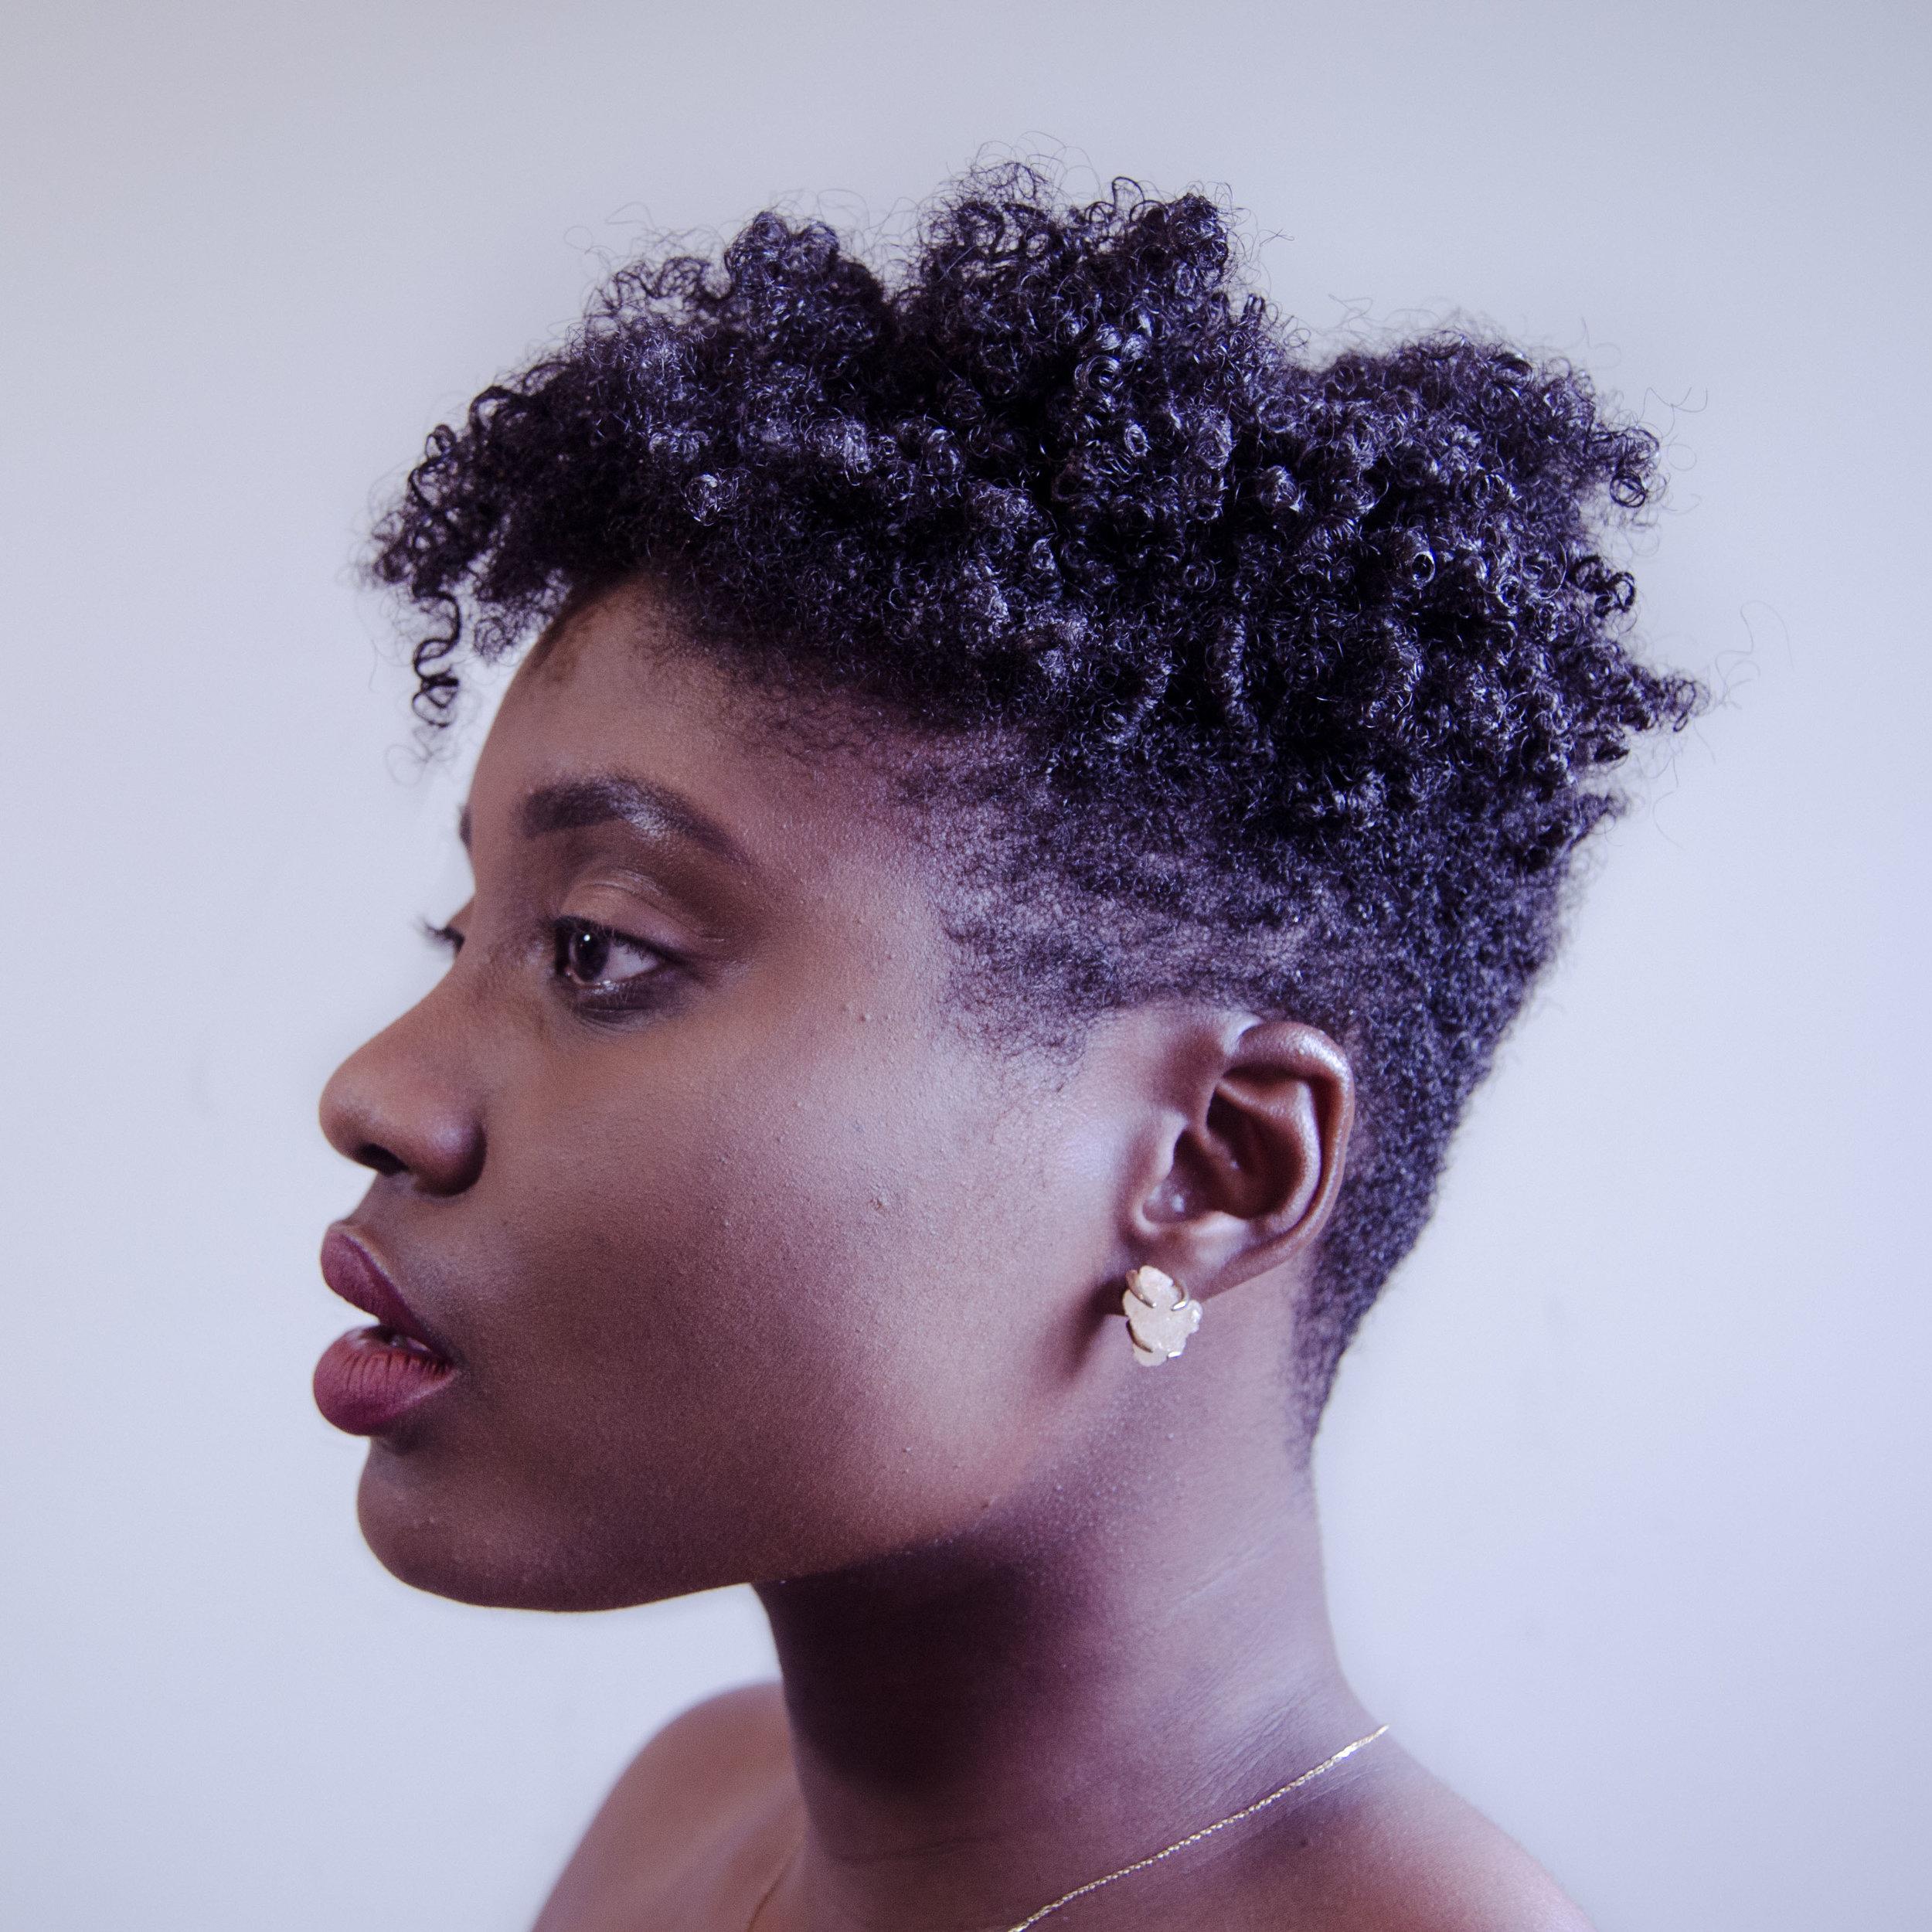 New hair cut-profile (1 of 1).jpg